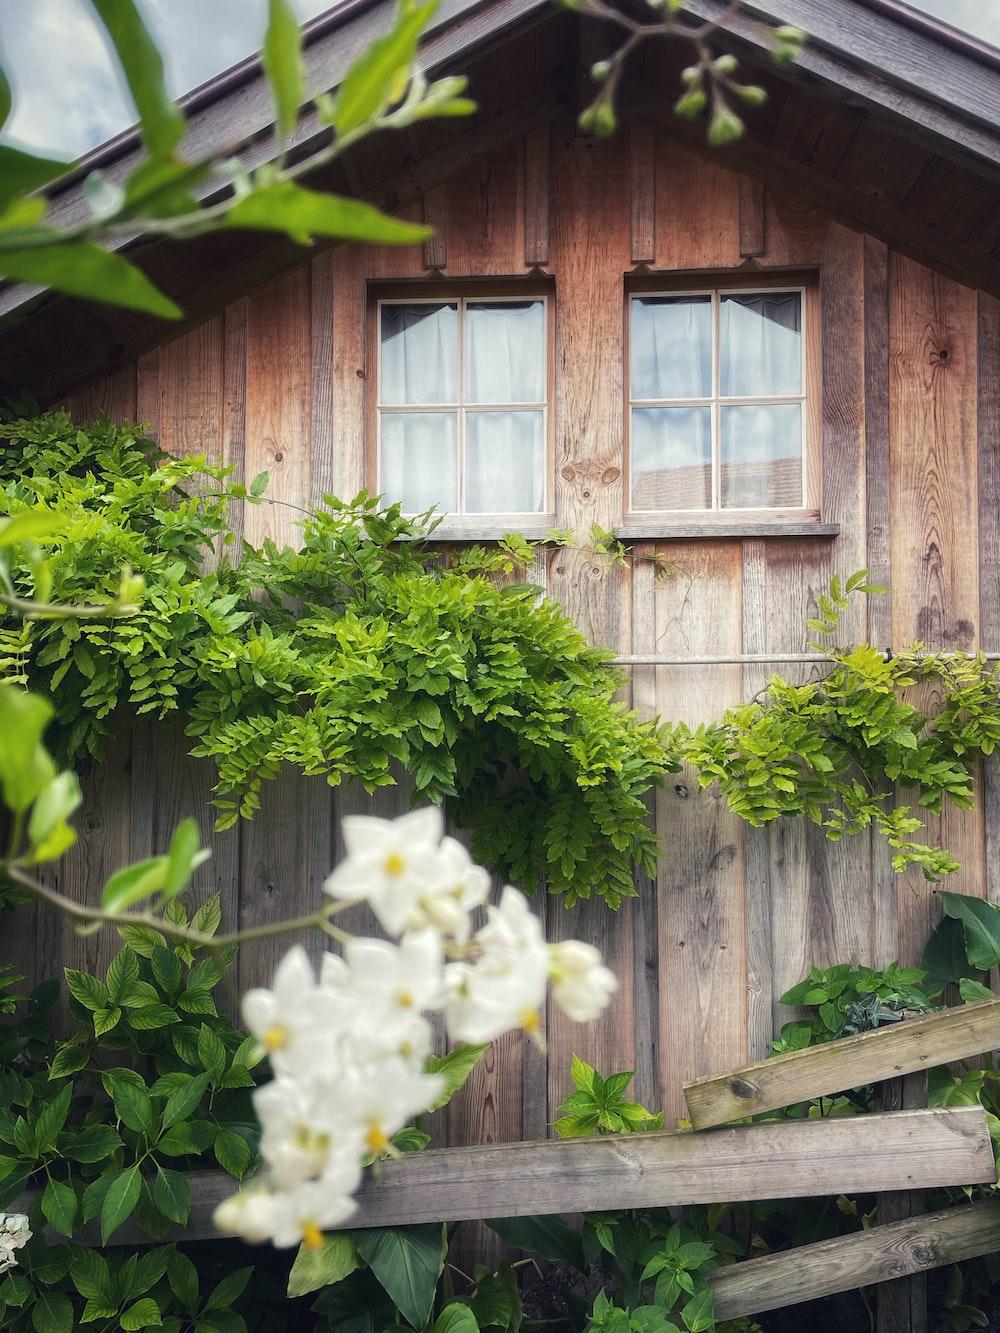 white flower near brown wooden fence